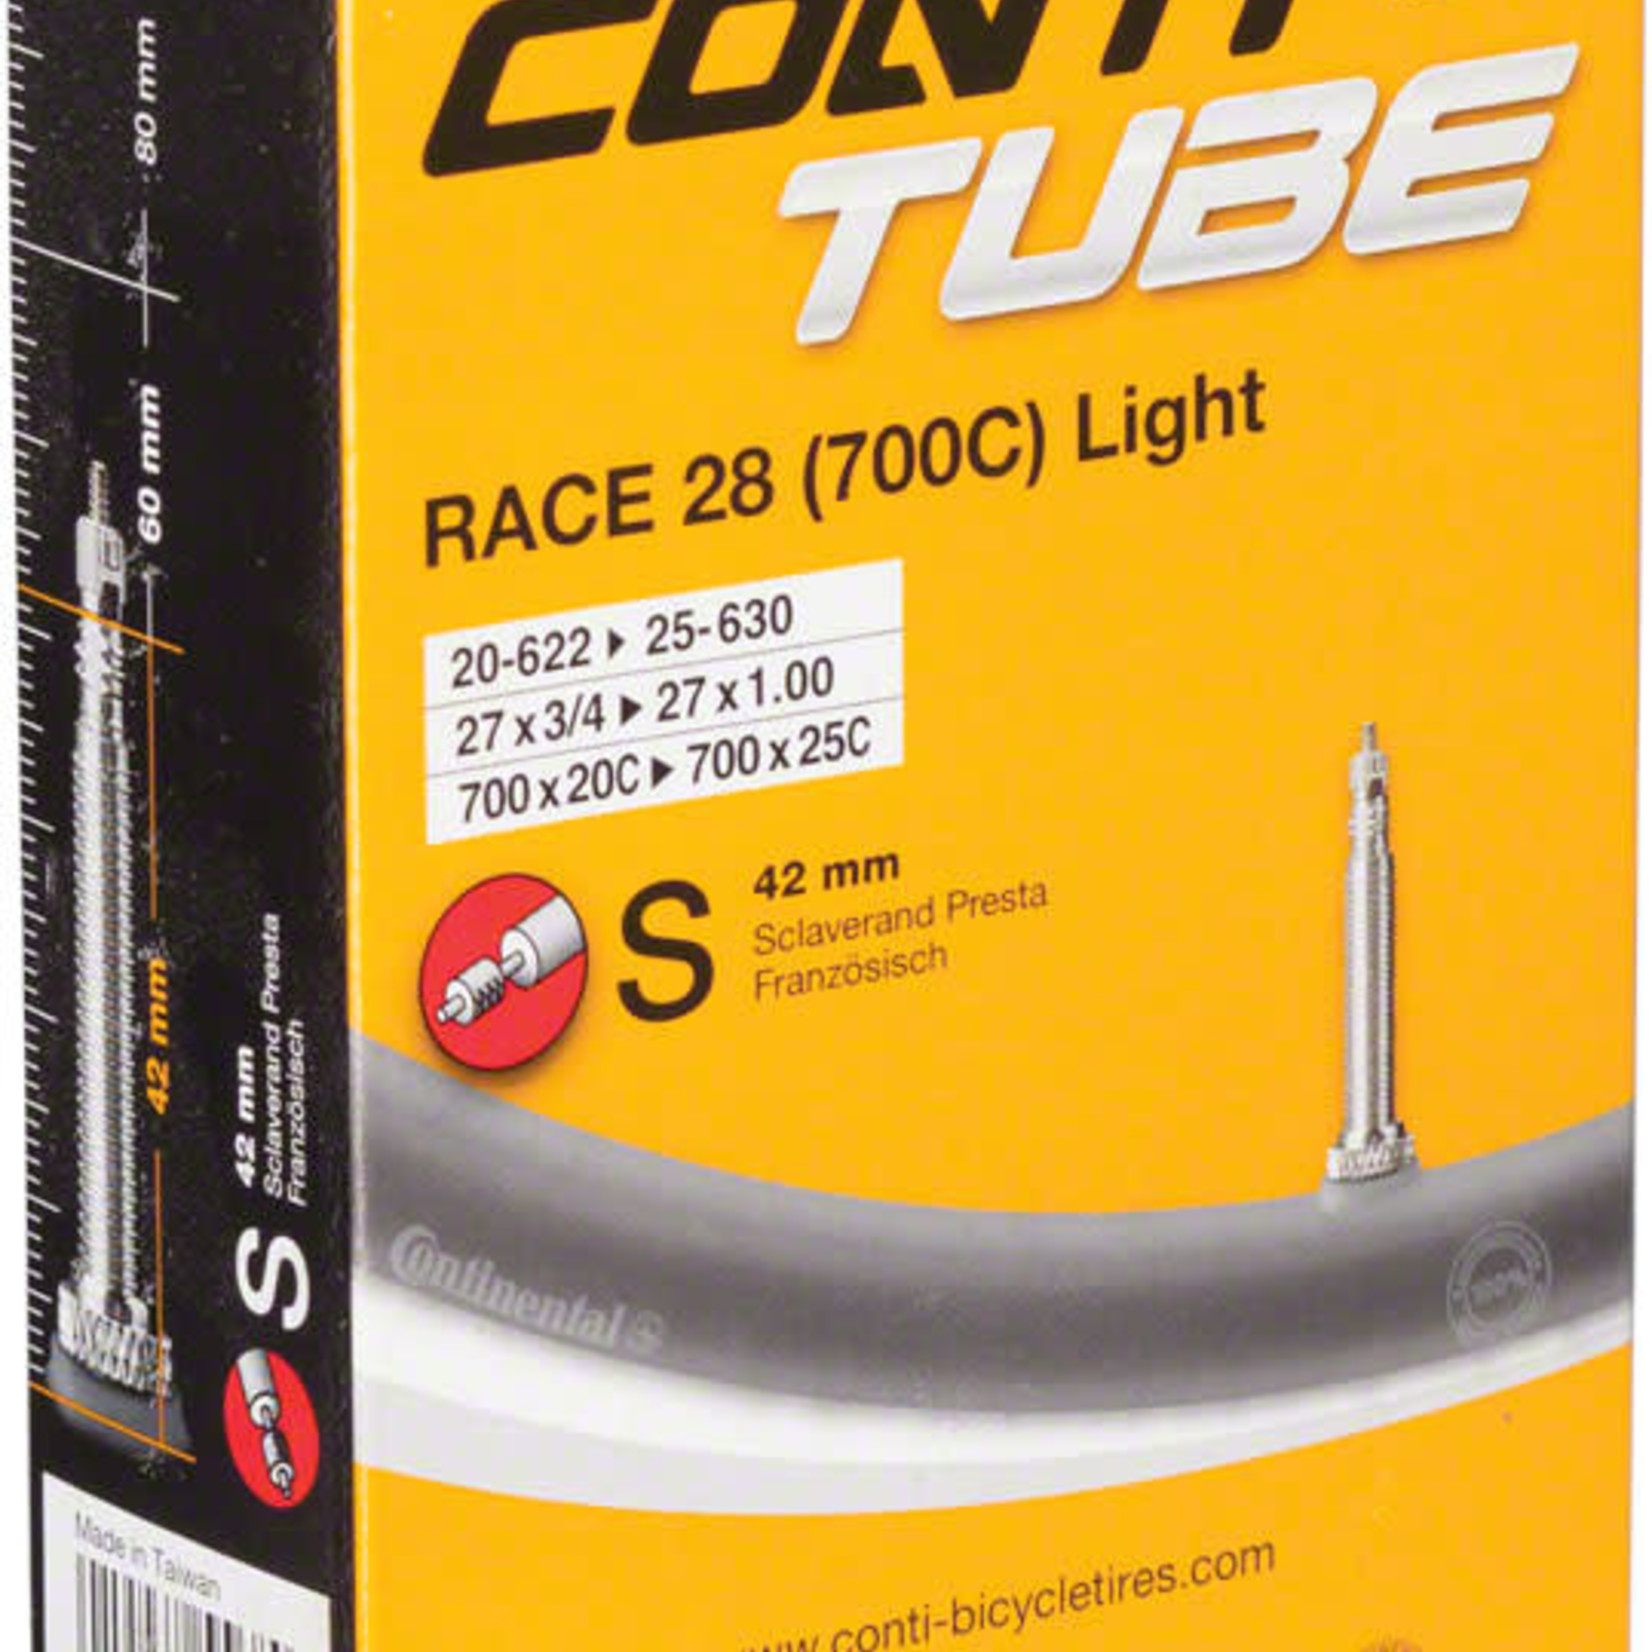 Continental Continental Light 700 x 20-25mm 42mm Presta Valve Tube